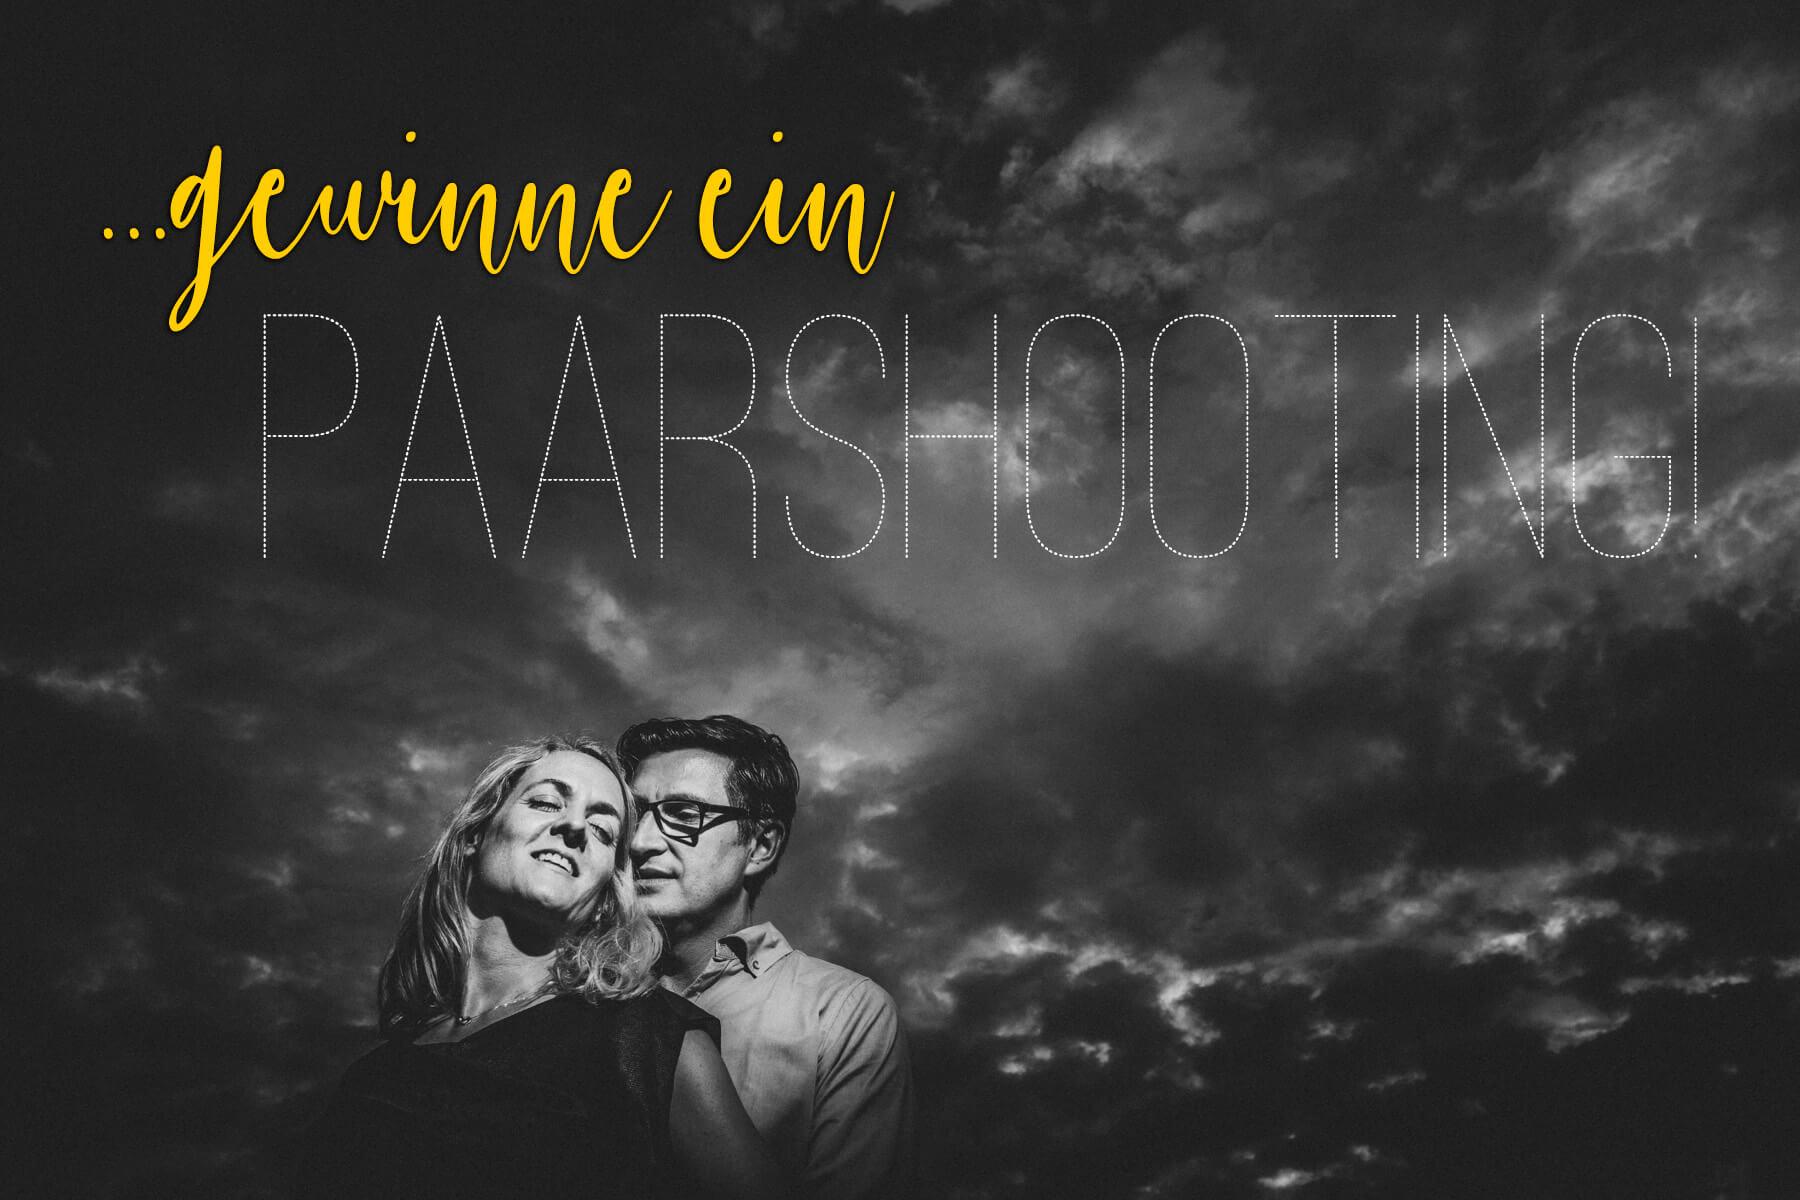 Paar-Shooting zu gewinnen! * Rossi Photography * Gewinnspiel 2019